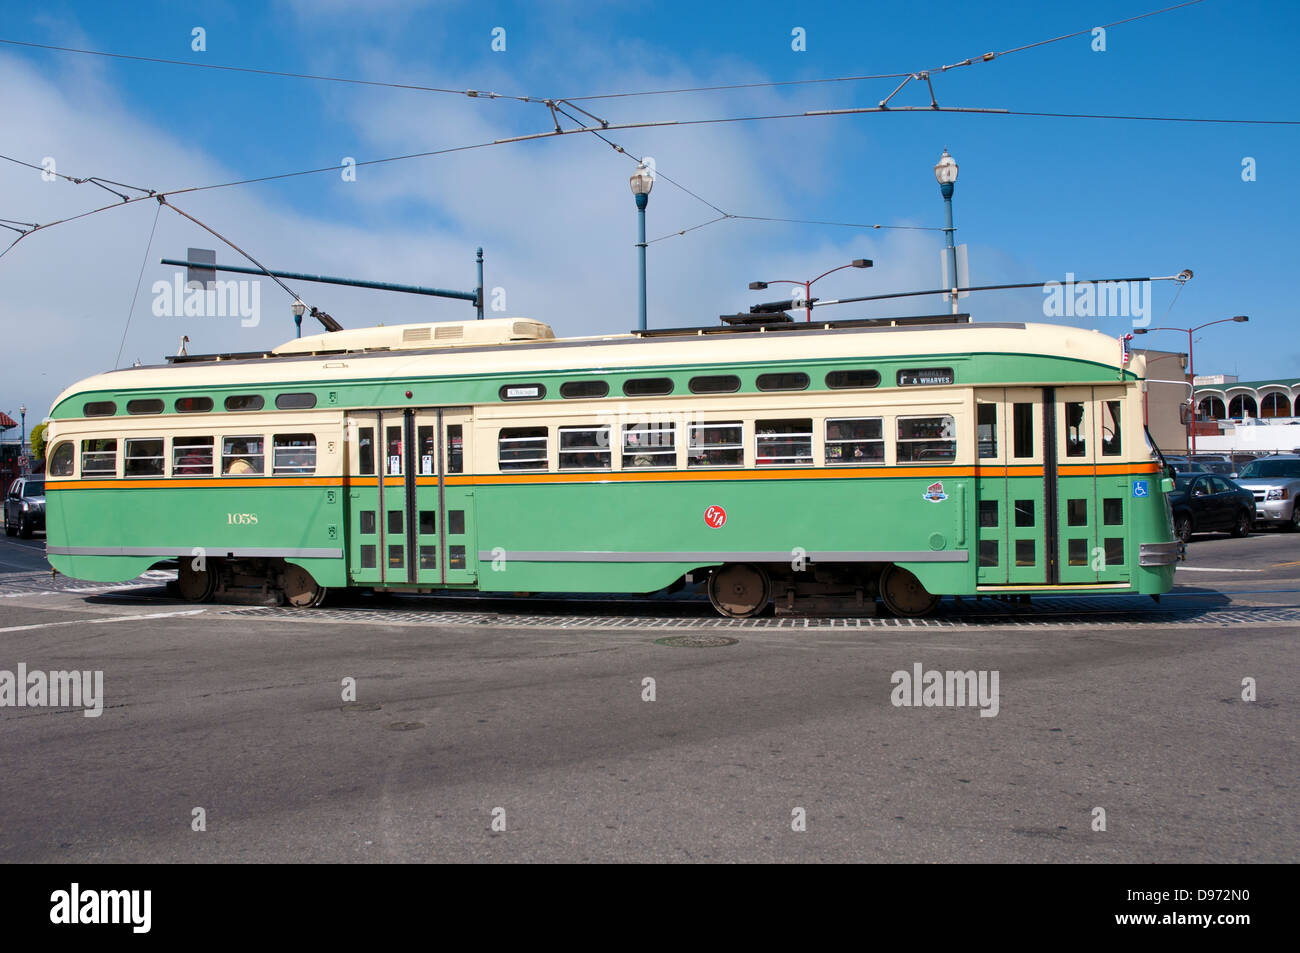 Cable Car in San Francisco, California - Stock Image